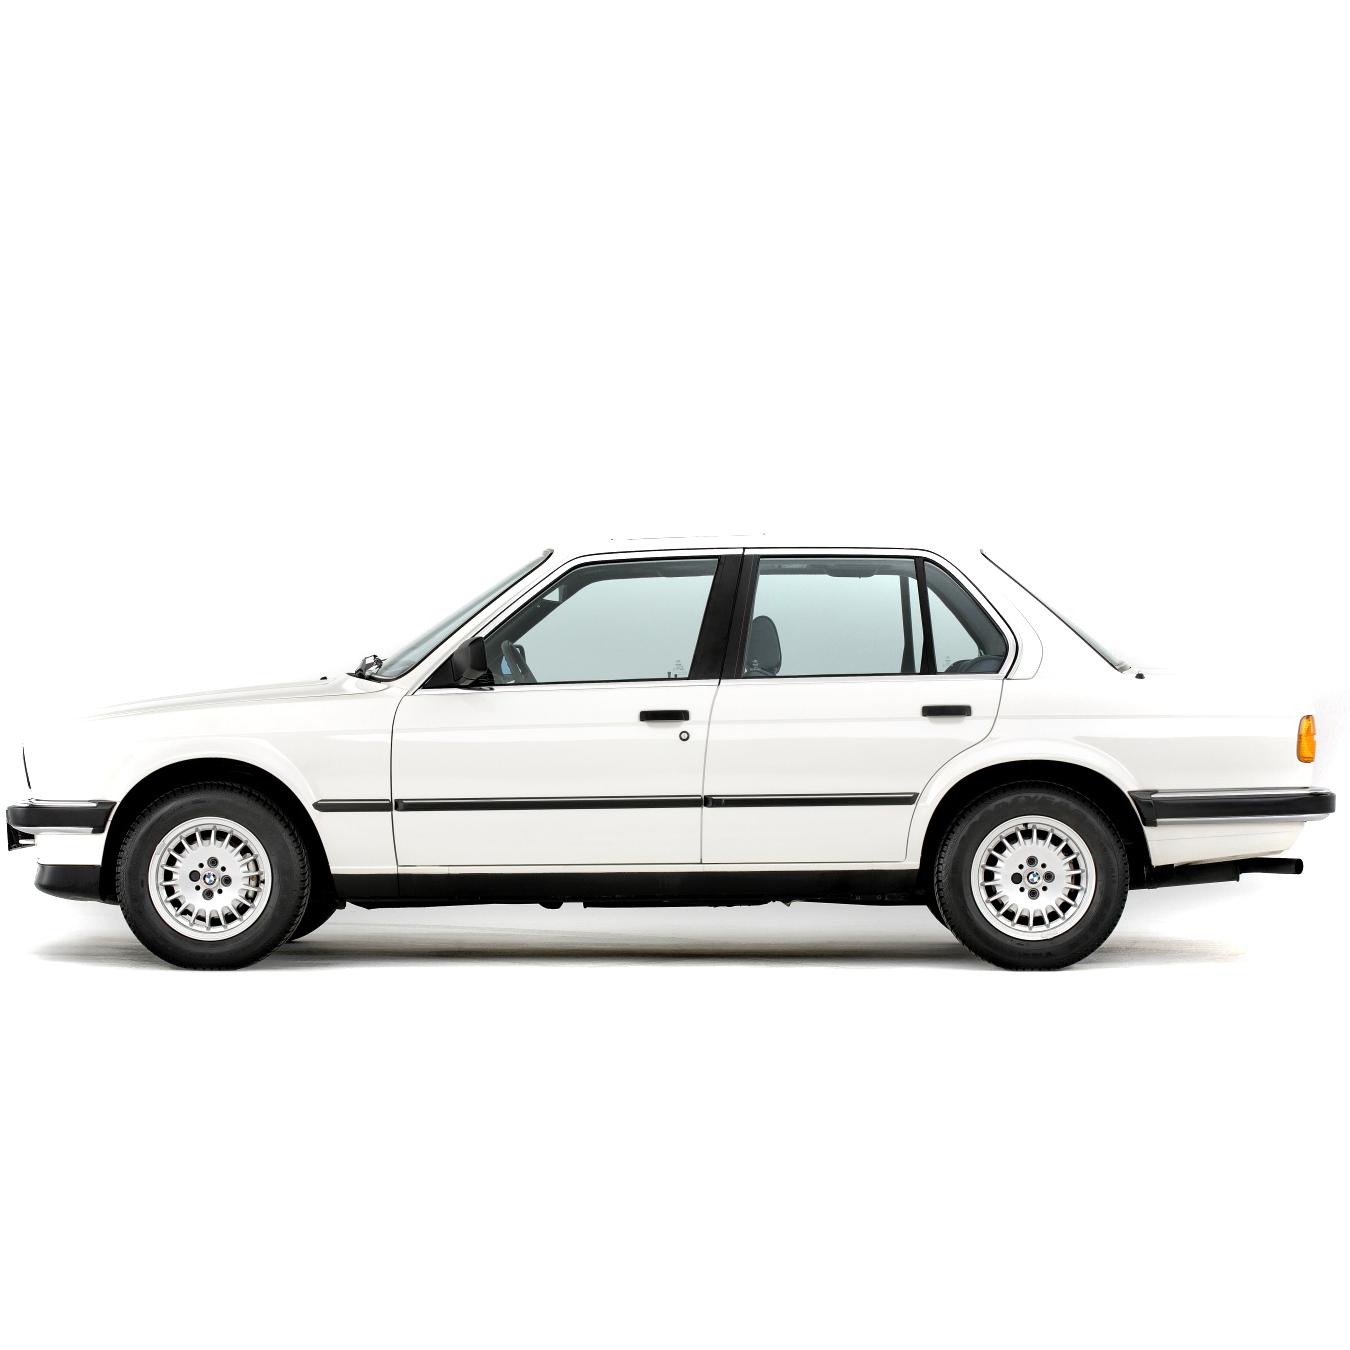 BMW 3 Series (E30) 1984-1991